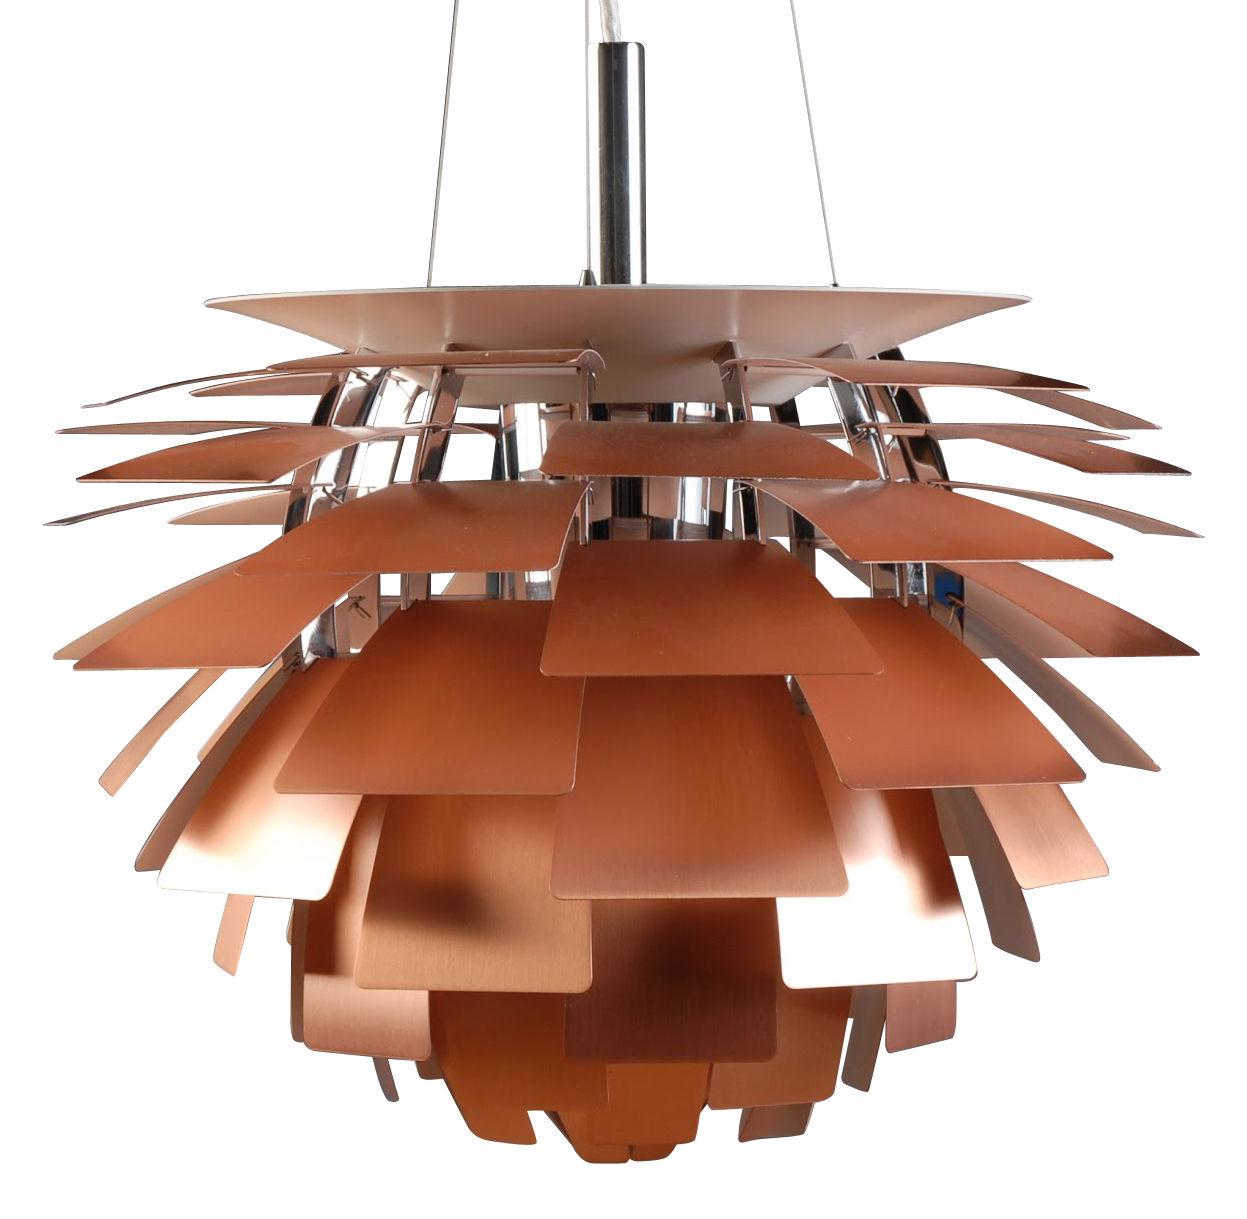 Leuchten - Pendelleuchten - PH Artichoke Pendelleuchte Ø 48 cm - Louis Poulsen - Kupfer - Aluminium, Stahl